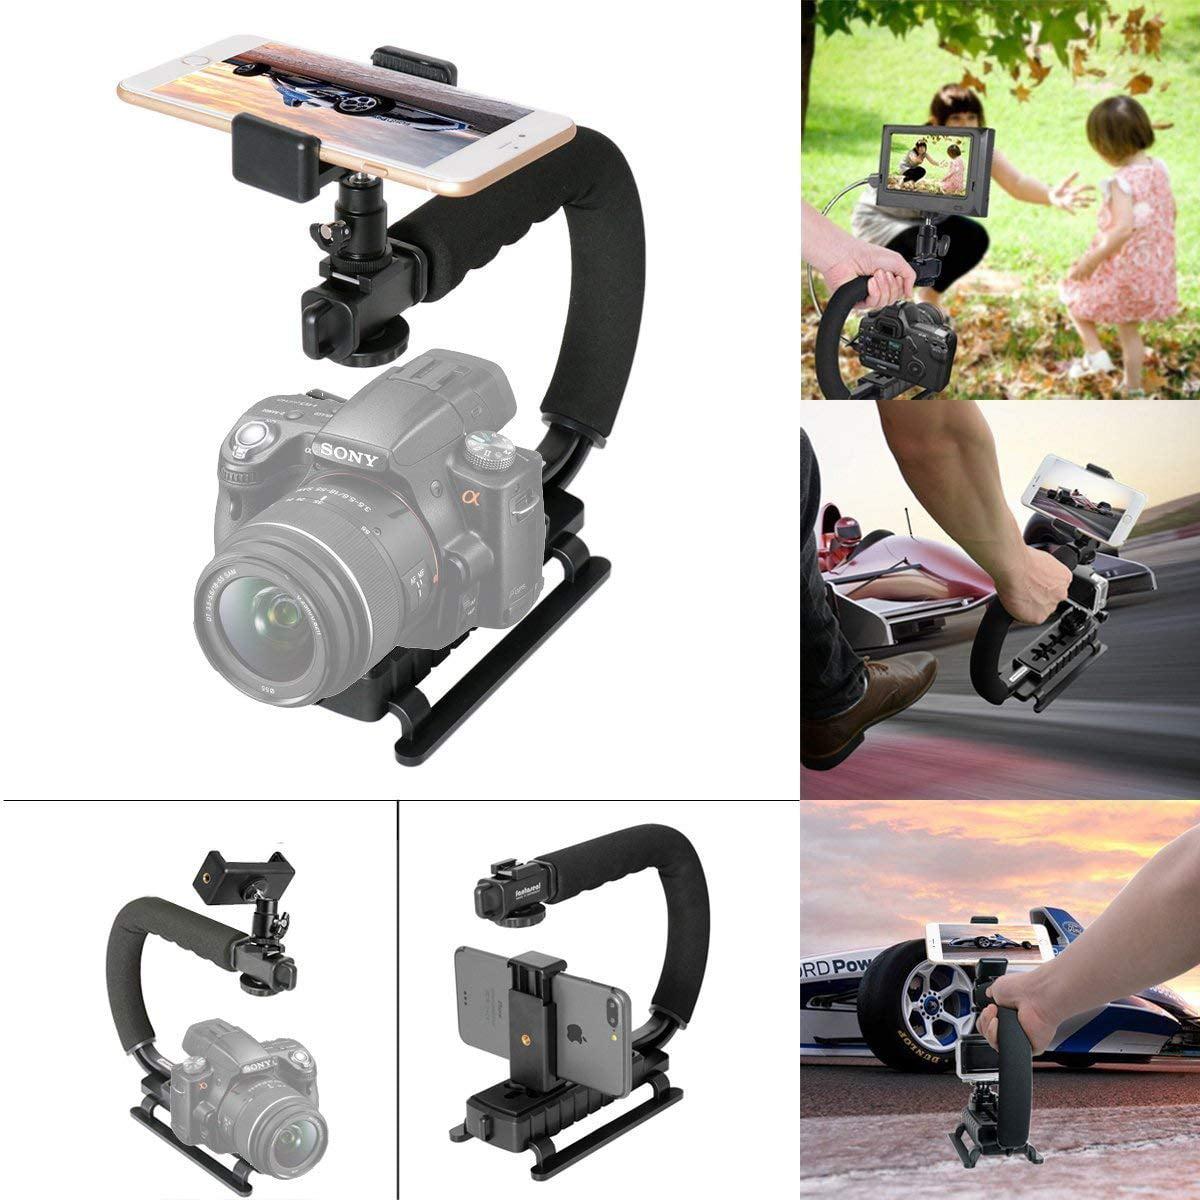 Fantaseal 4 in 1 Smartphone Action Camera Camcorder DSLR Camera Stabilizer C Shape Rig Low Position Shooting S